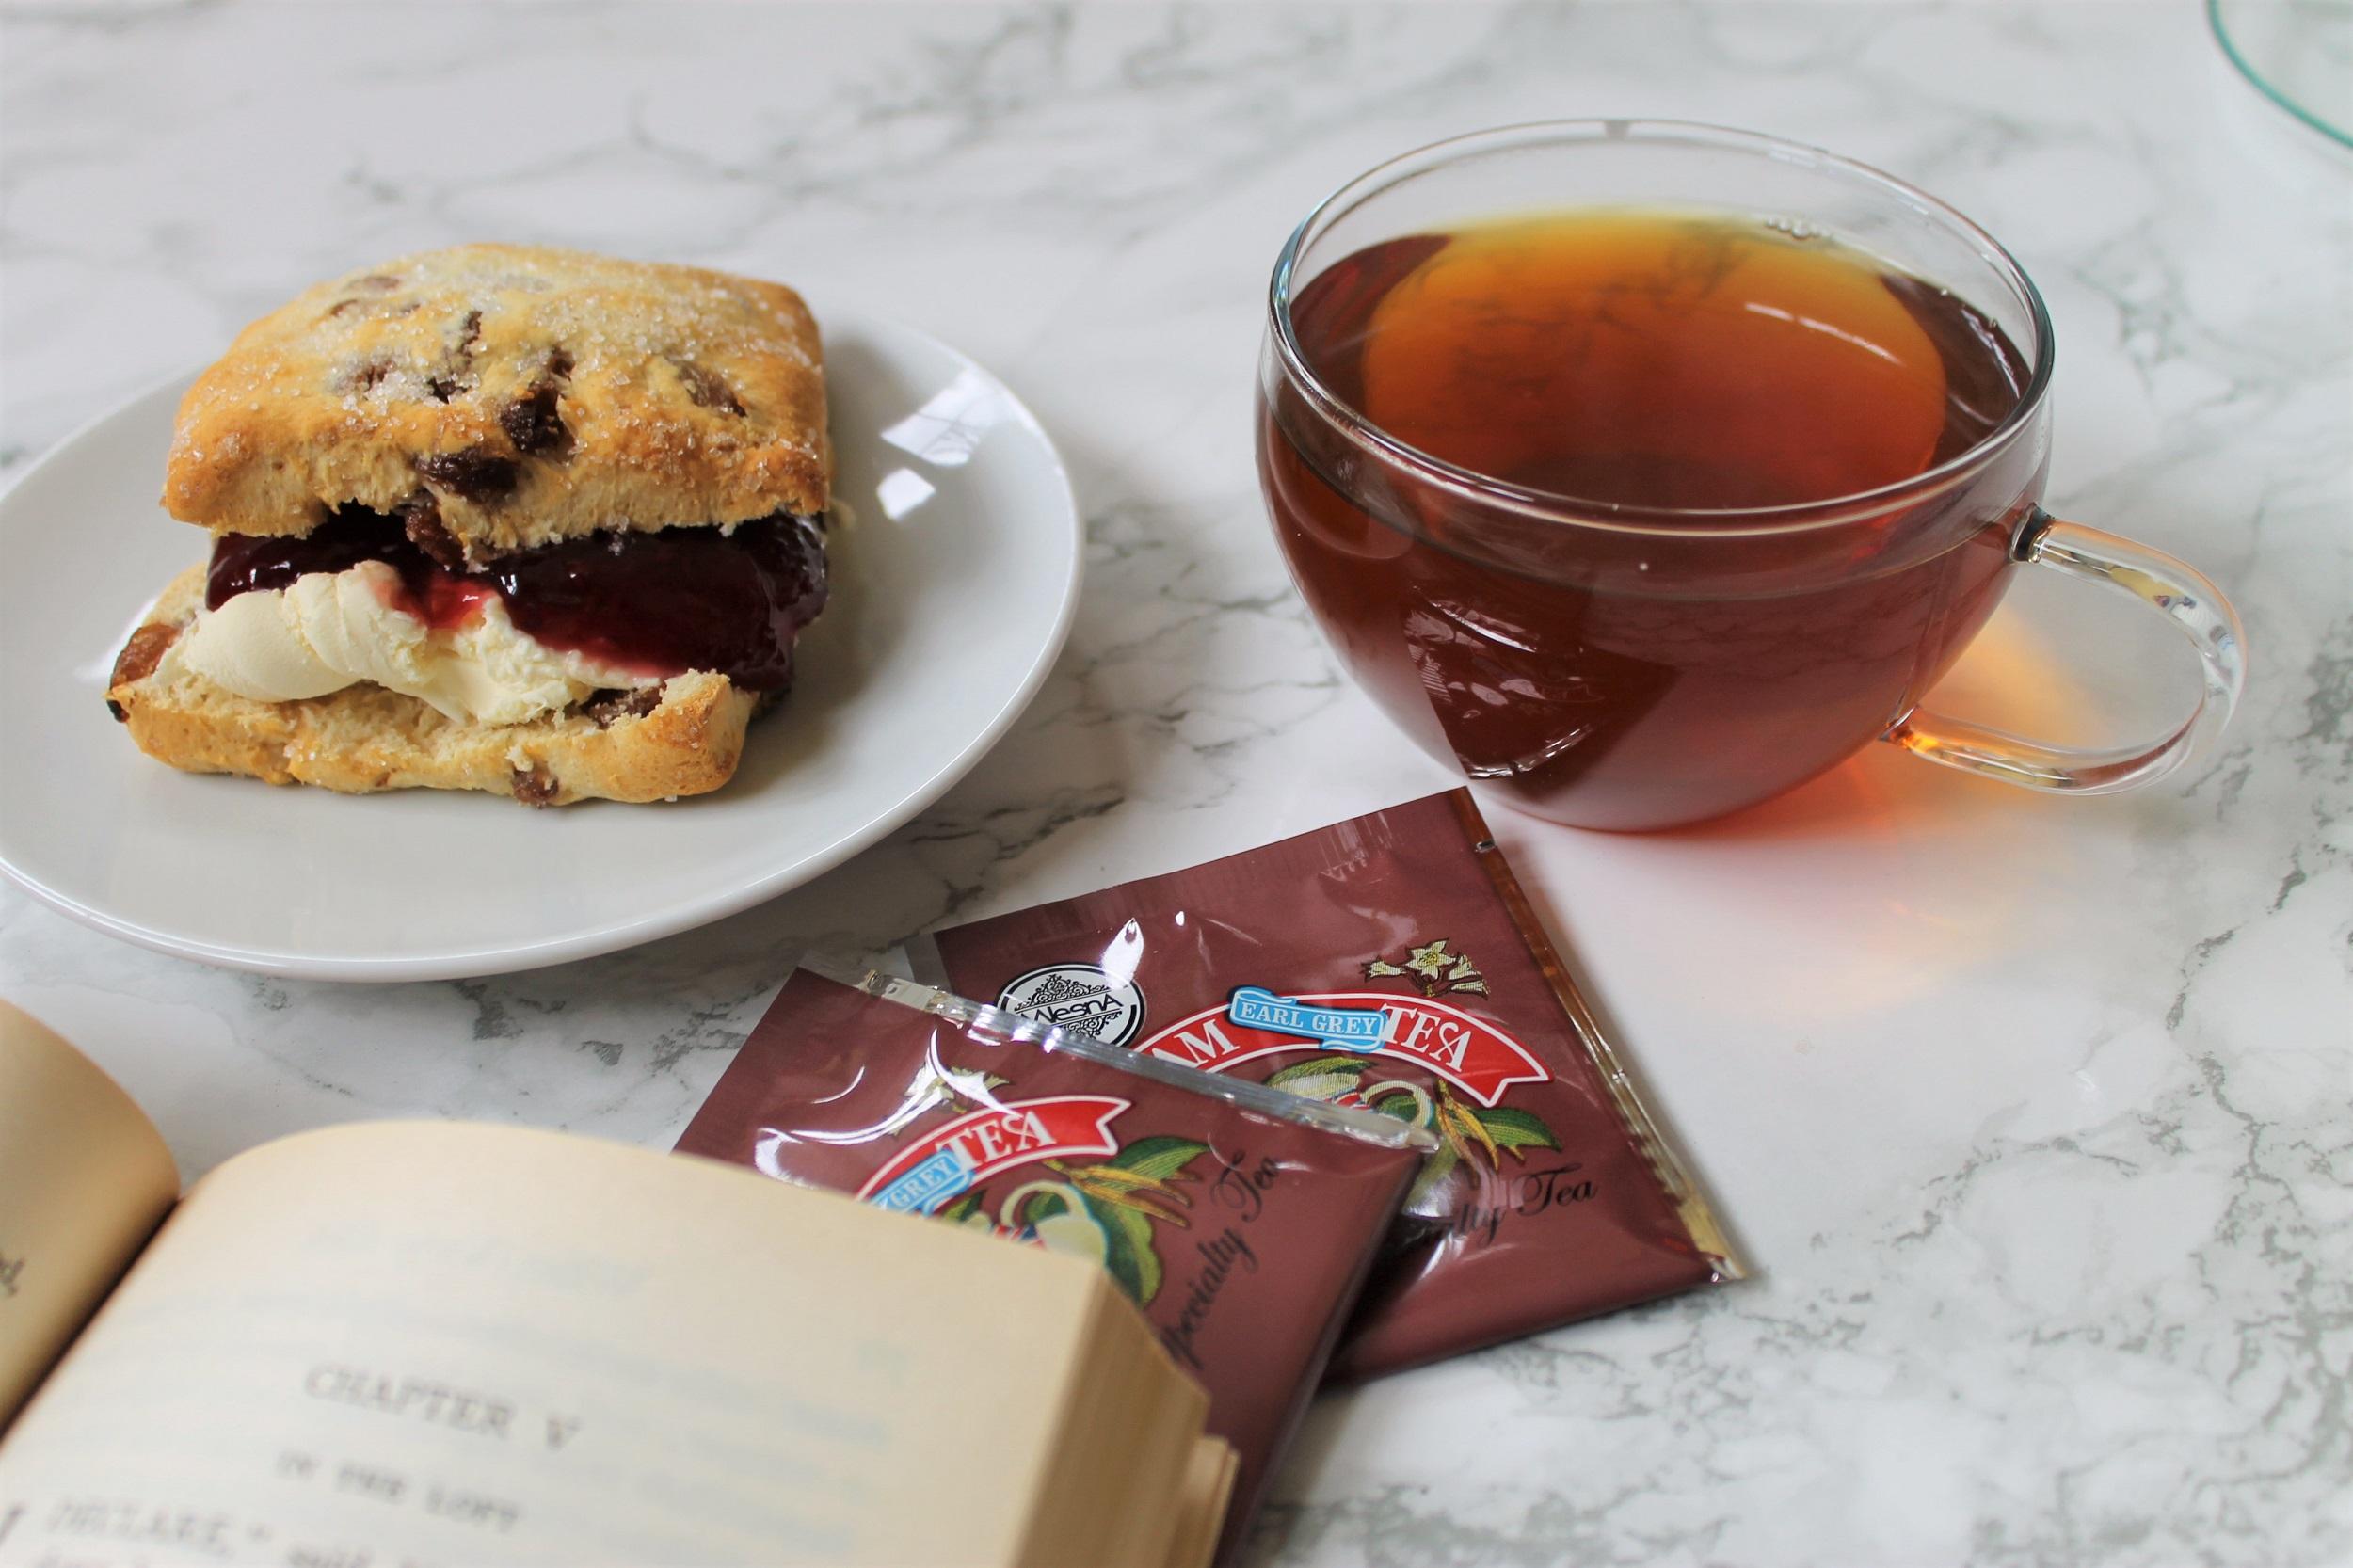 cream tea scone with book and black tea in teacup